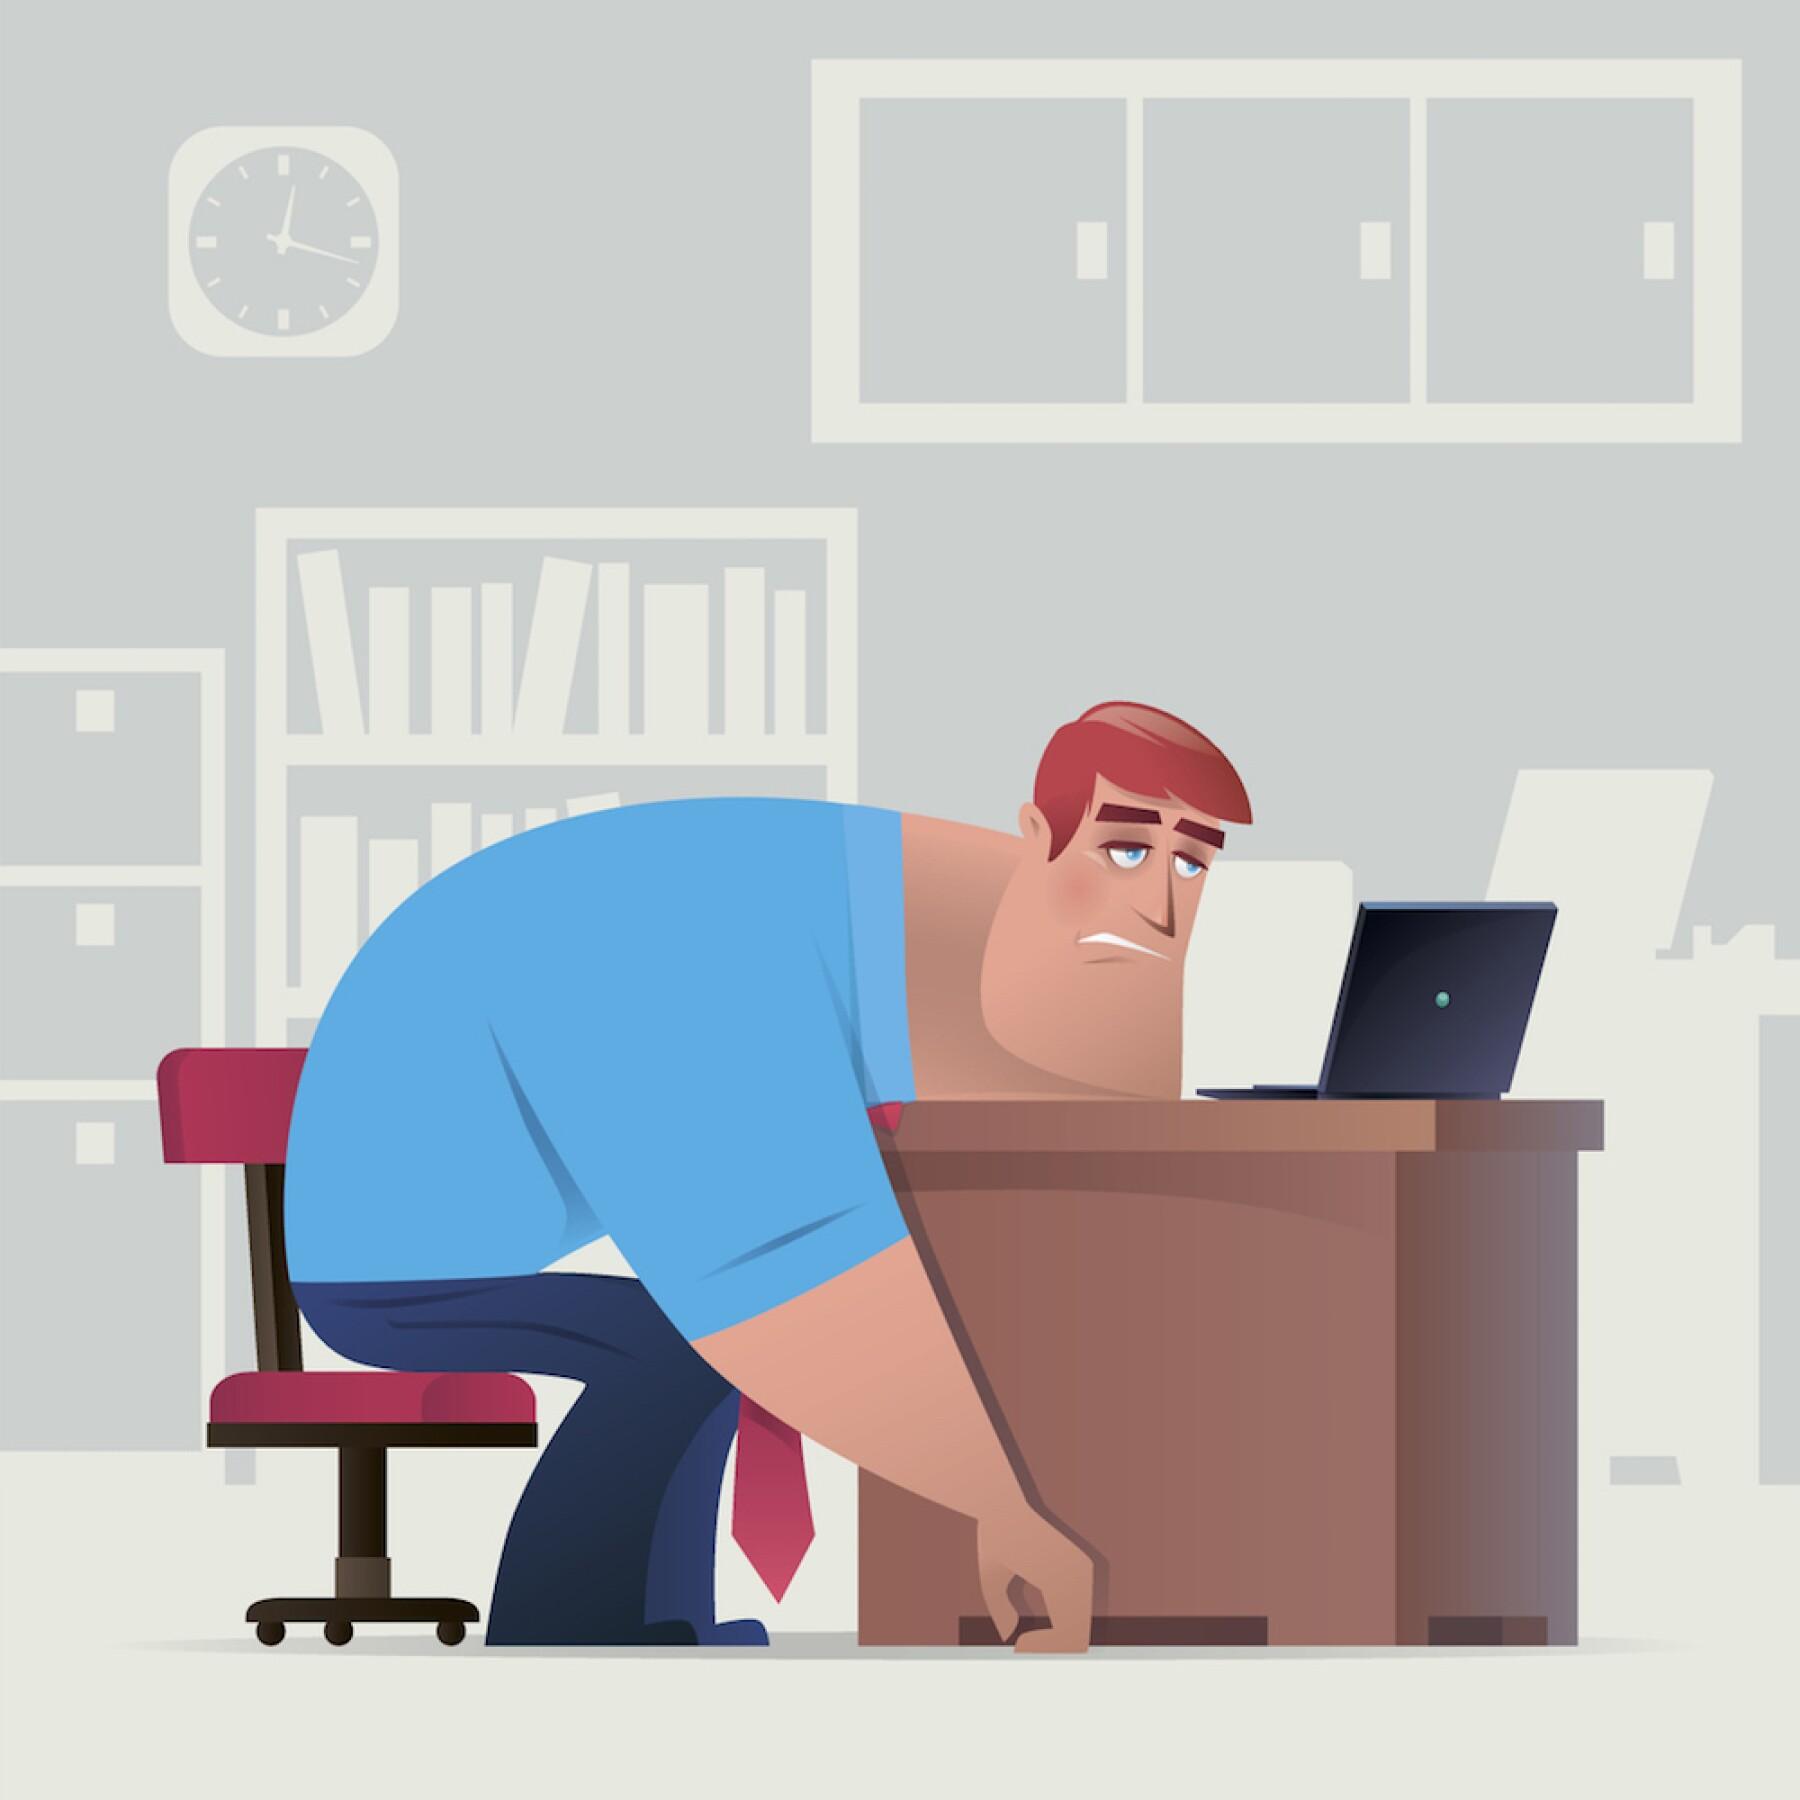 Mediocridad - mediocridad en la empresa - empresa mediocre - empleados mediocres - cultura laboral mediocre